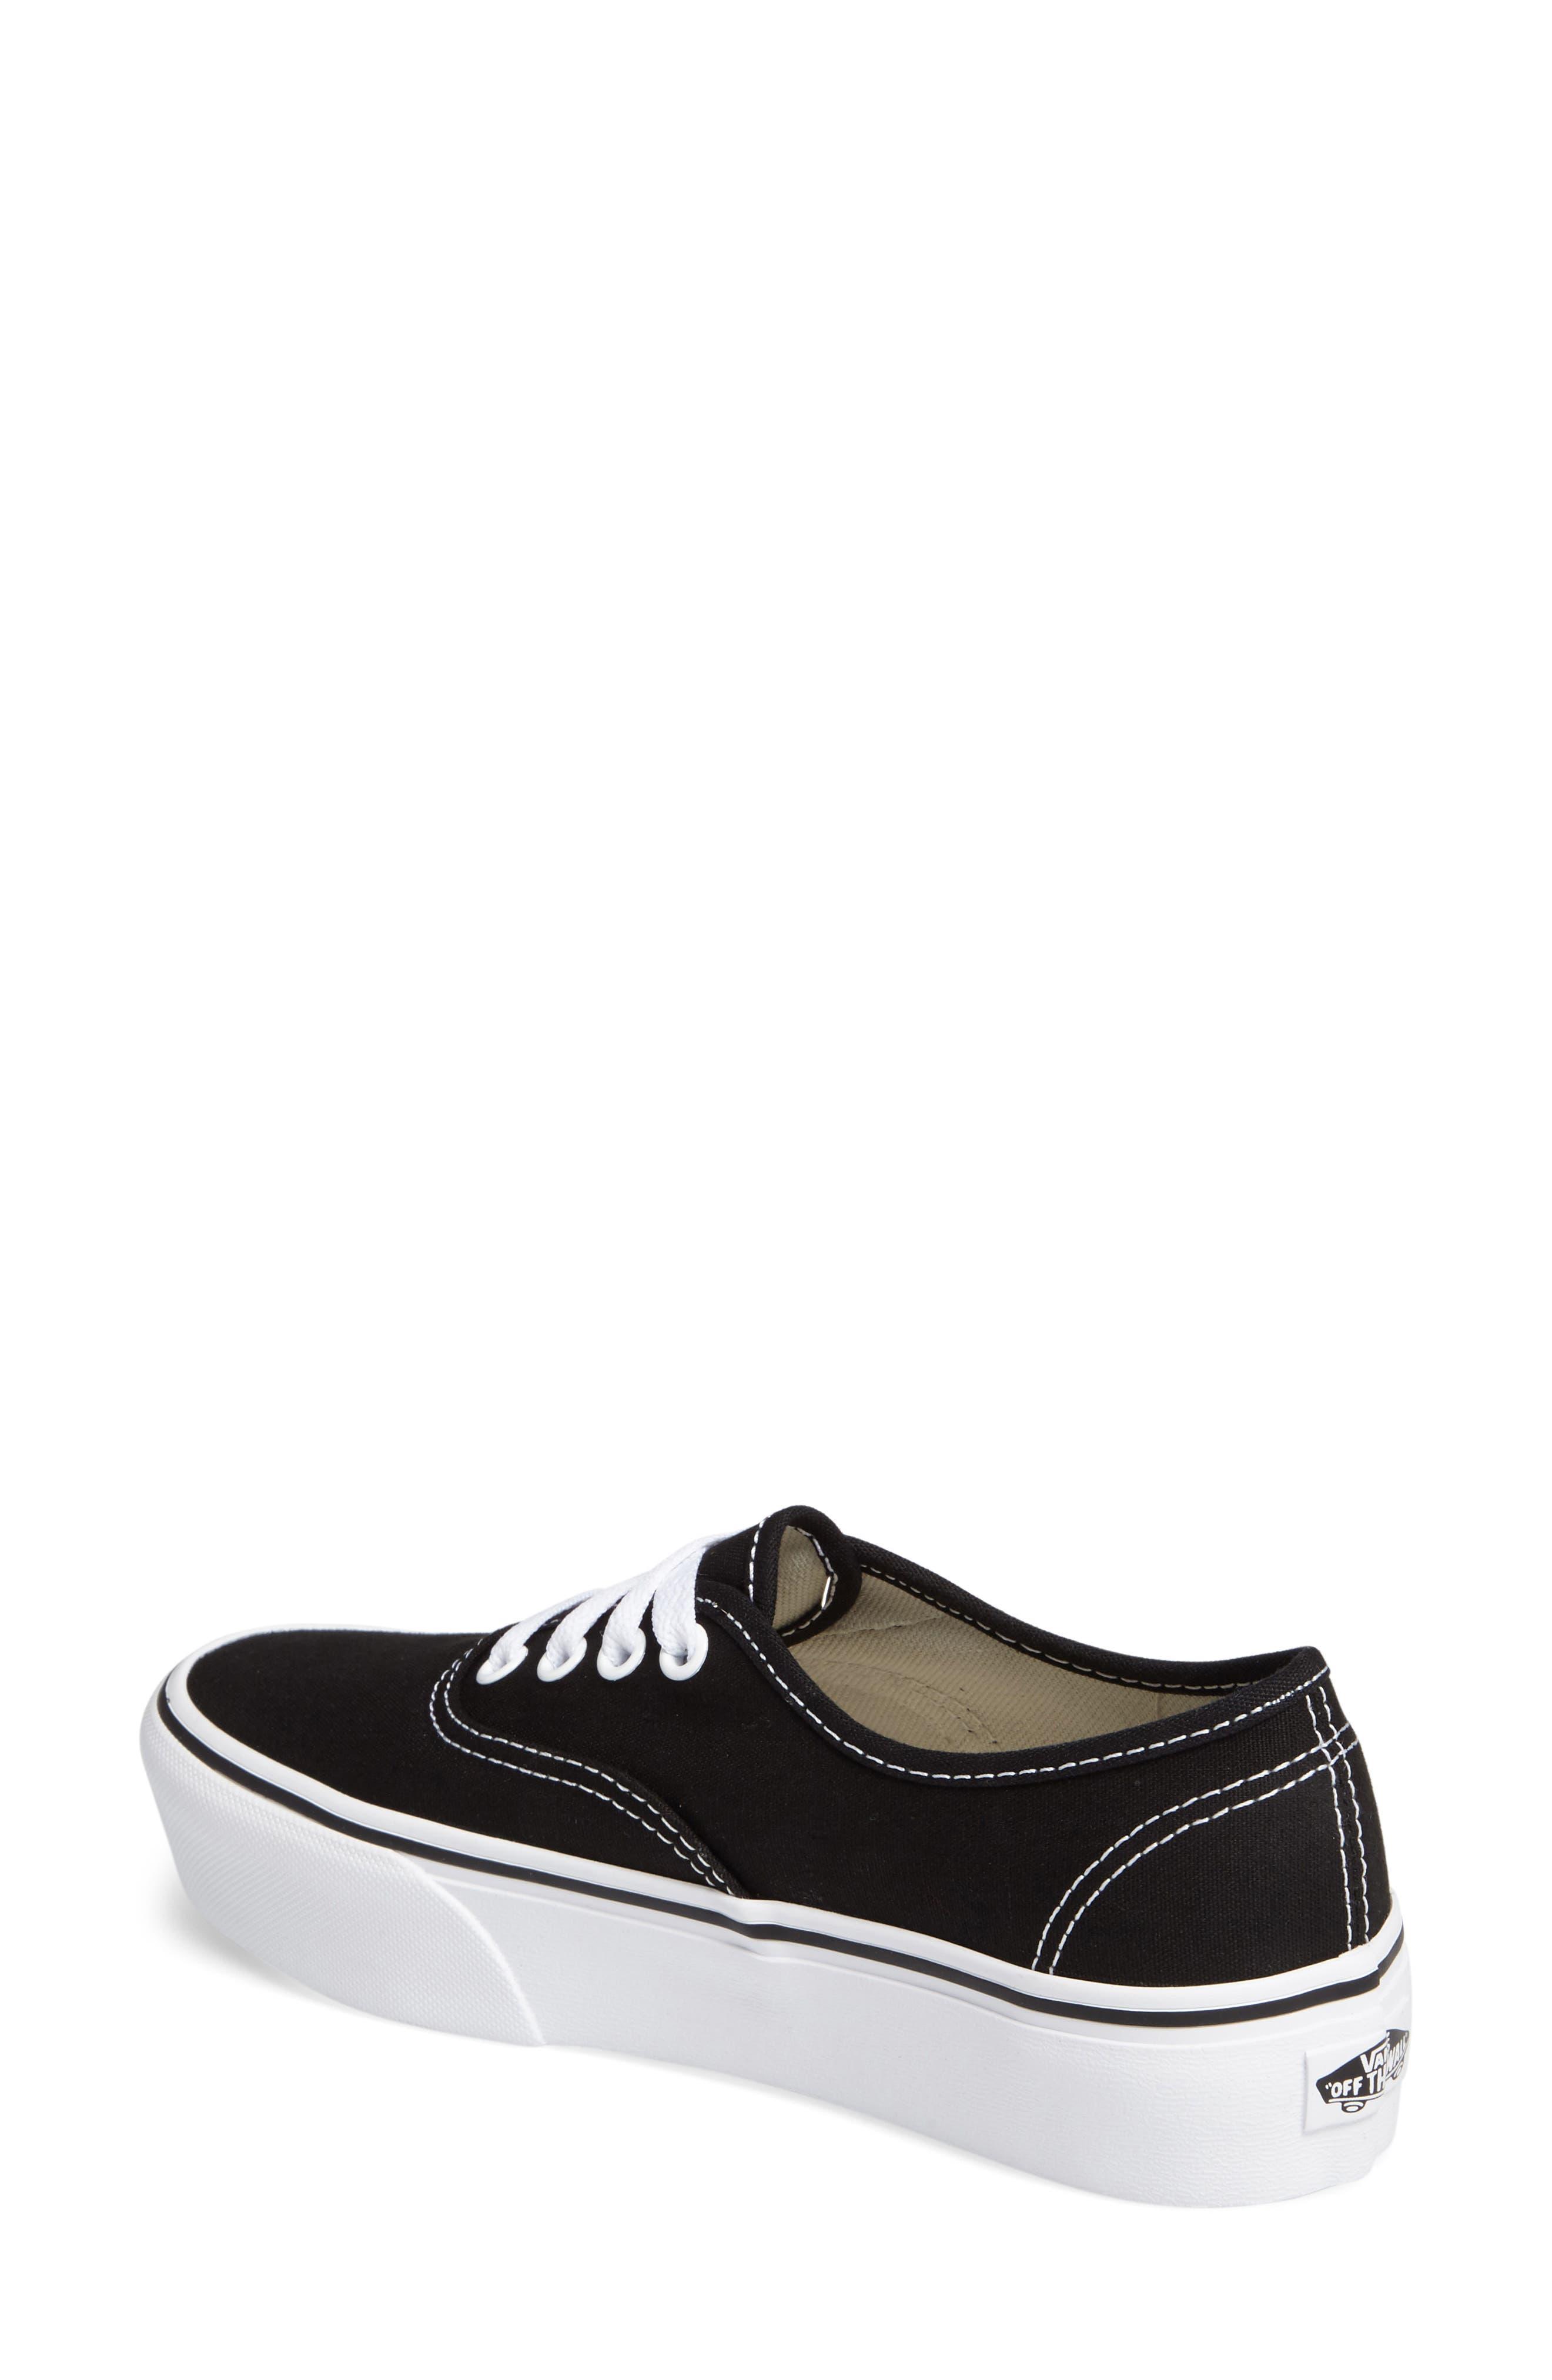 Alternate Image 2  - Vans 'Authentic' Platform Sneaker (Women)